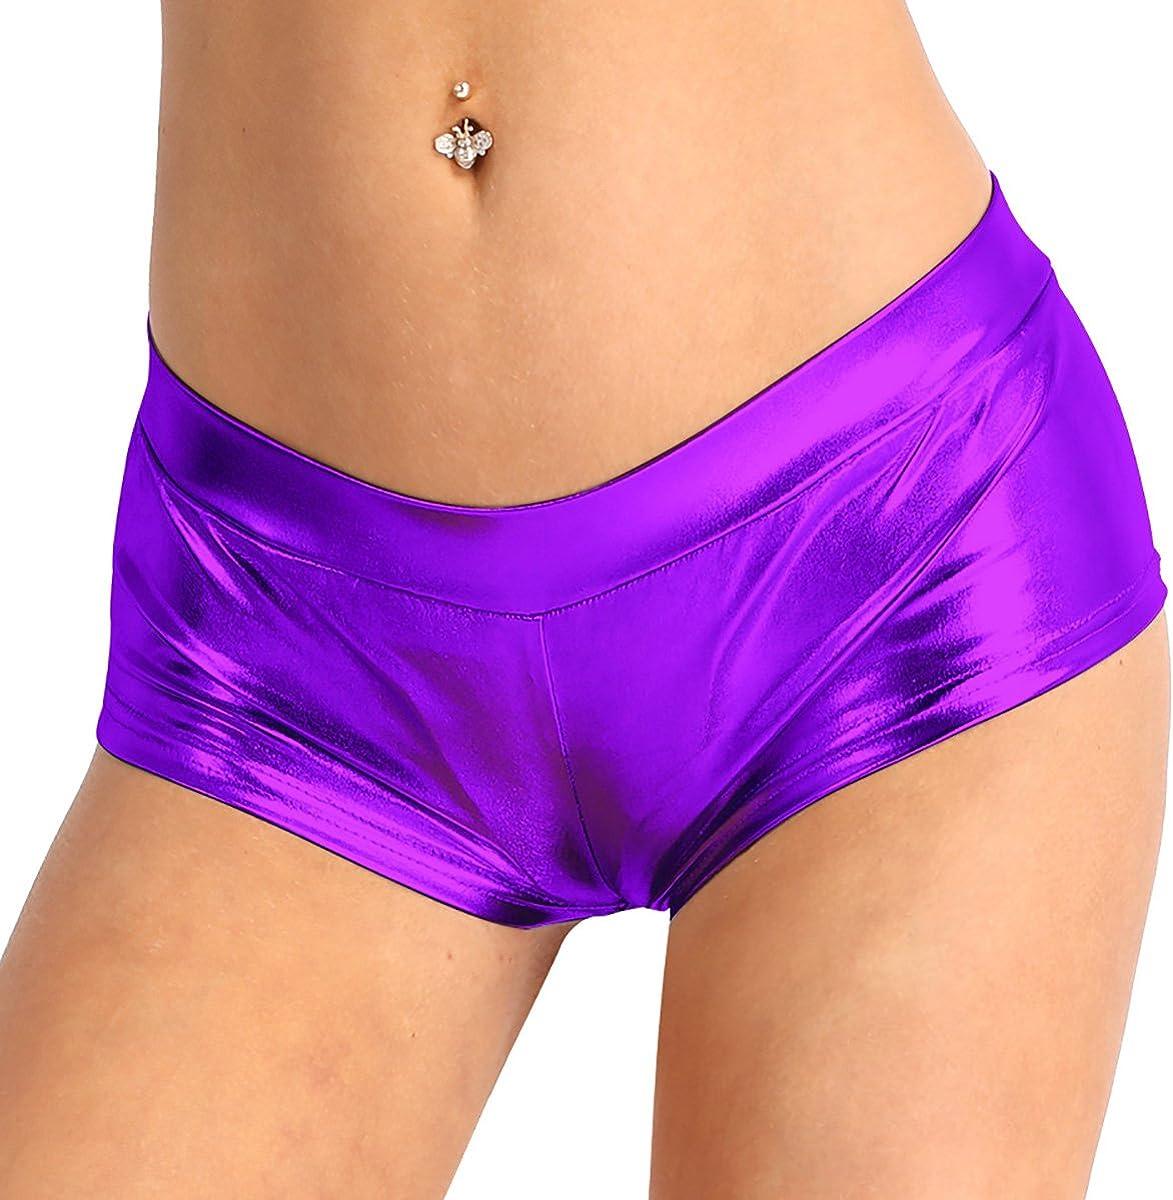 Hansber Womens Shiny Metallic Dance Booty Shorts Wet Look Rave Hot Pant Clubwear Bottoms